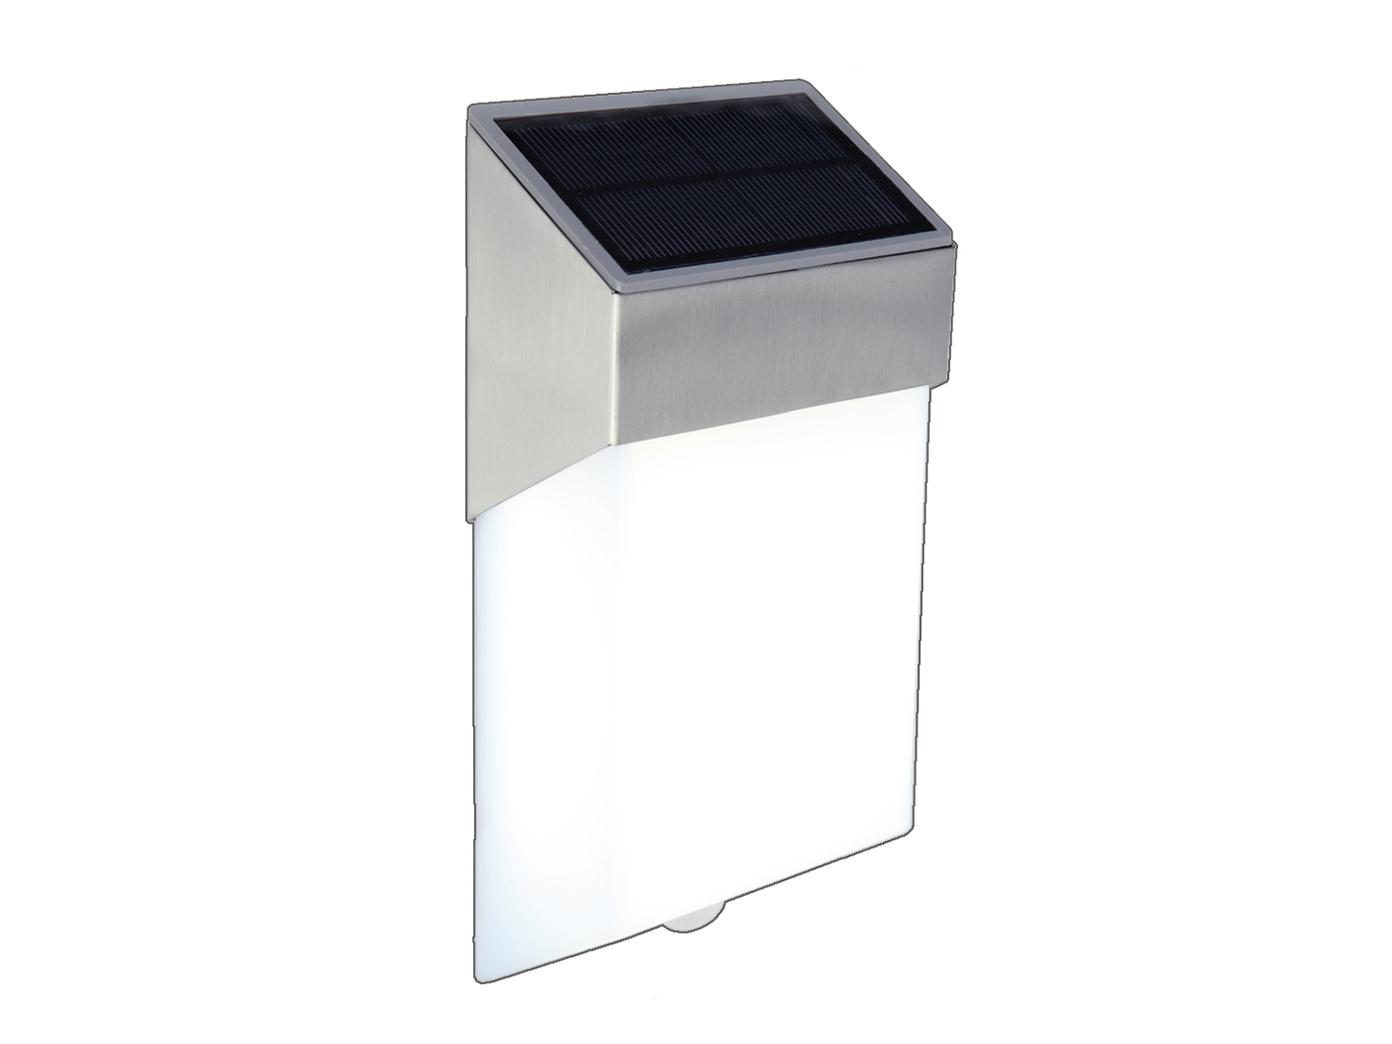 LED-Ausenwandleuchte-mit-Solar-Bewegungsmelder-Hausnummern-IP44-Wandleuchten miniatura 2